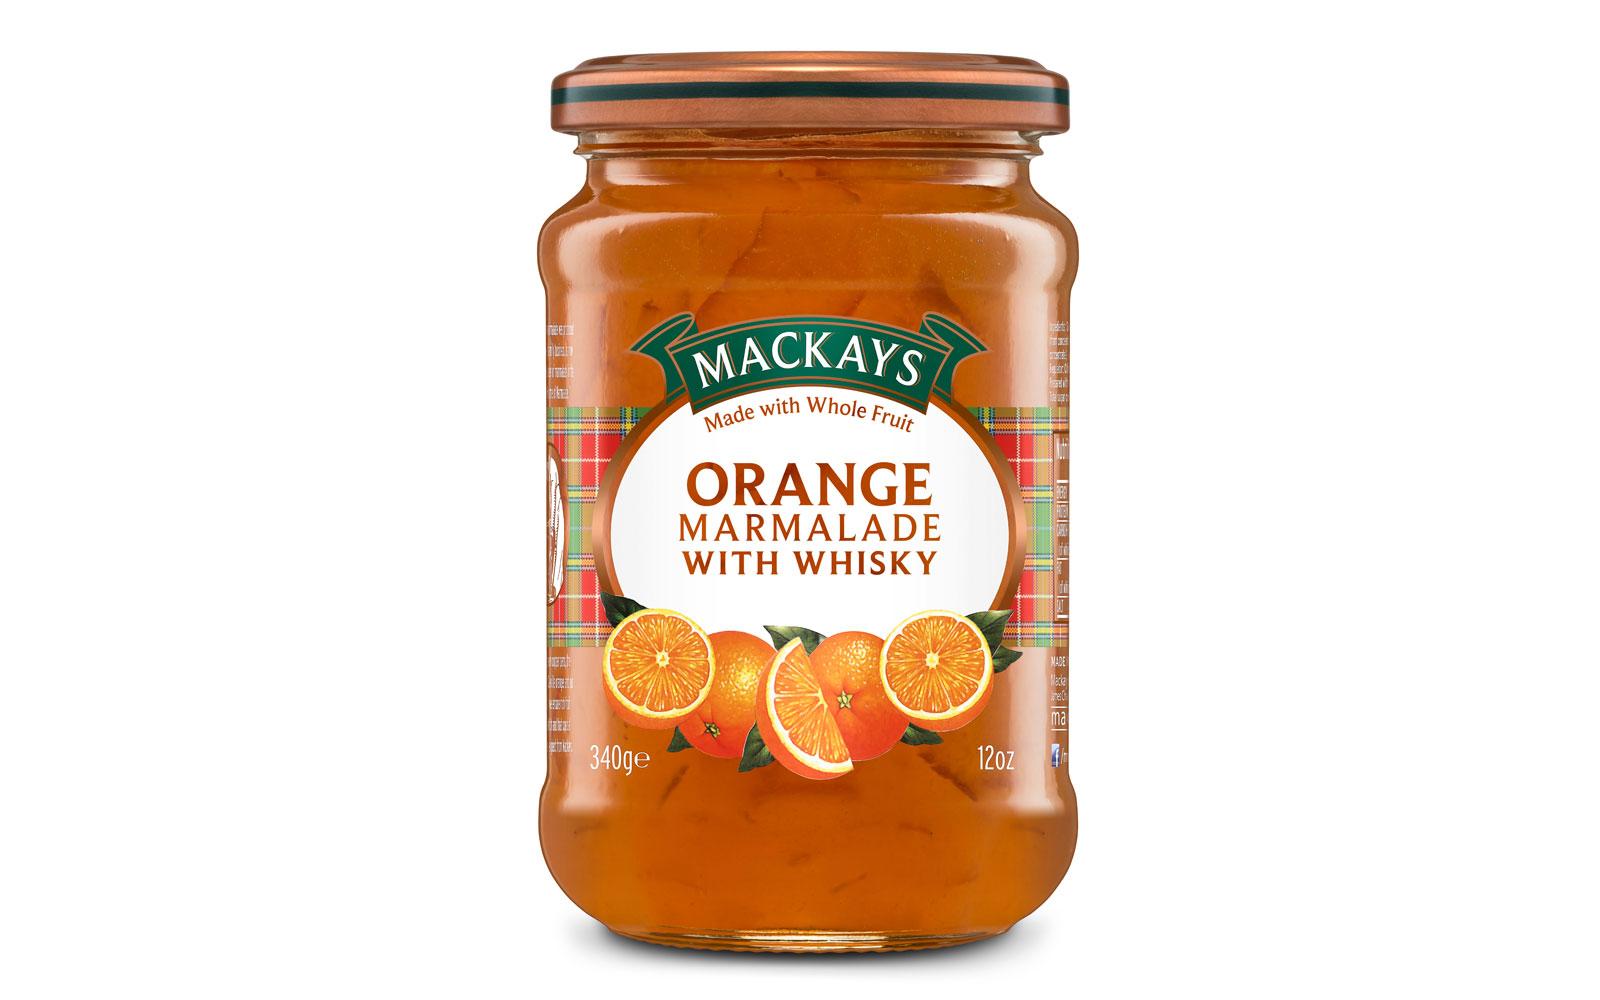 mackays orange marmalade with whisky